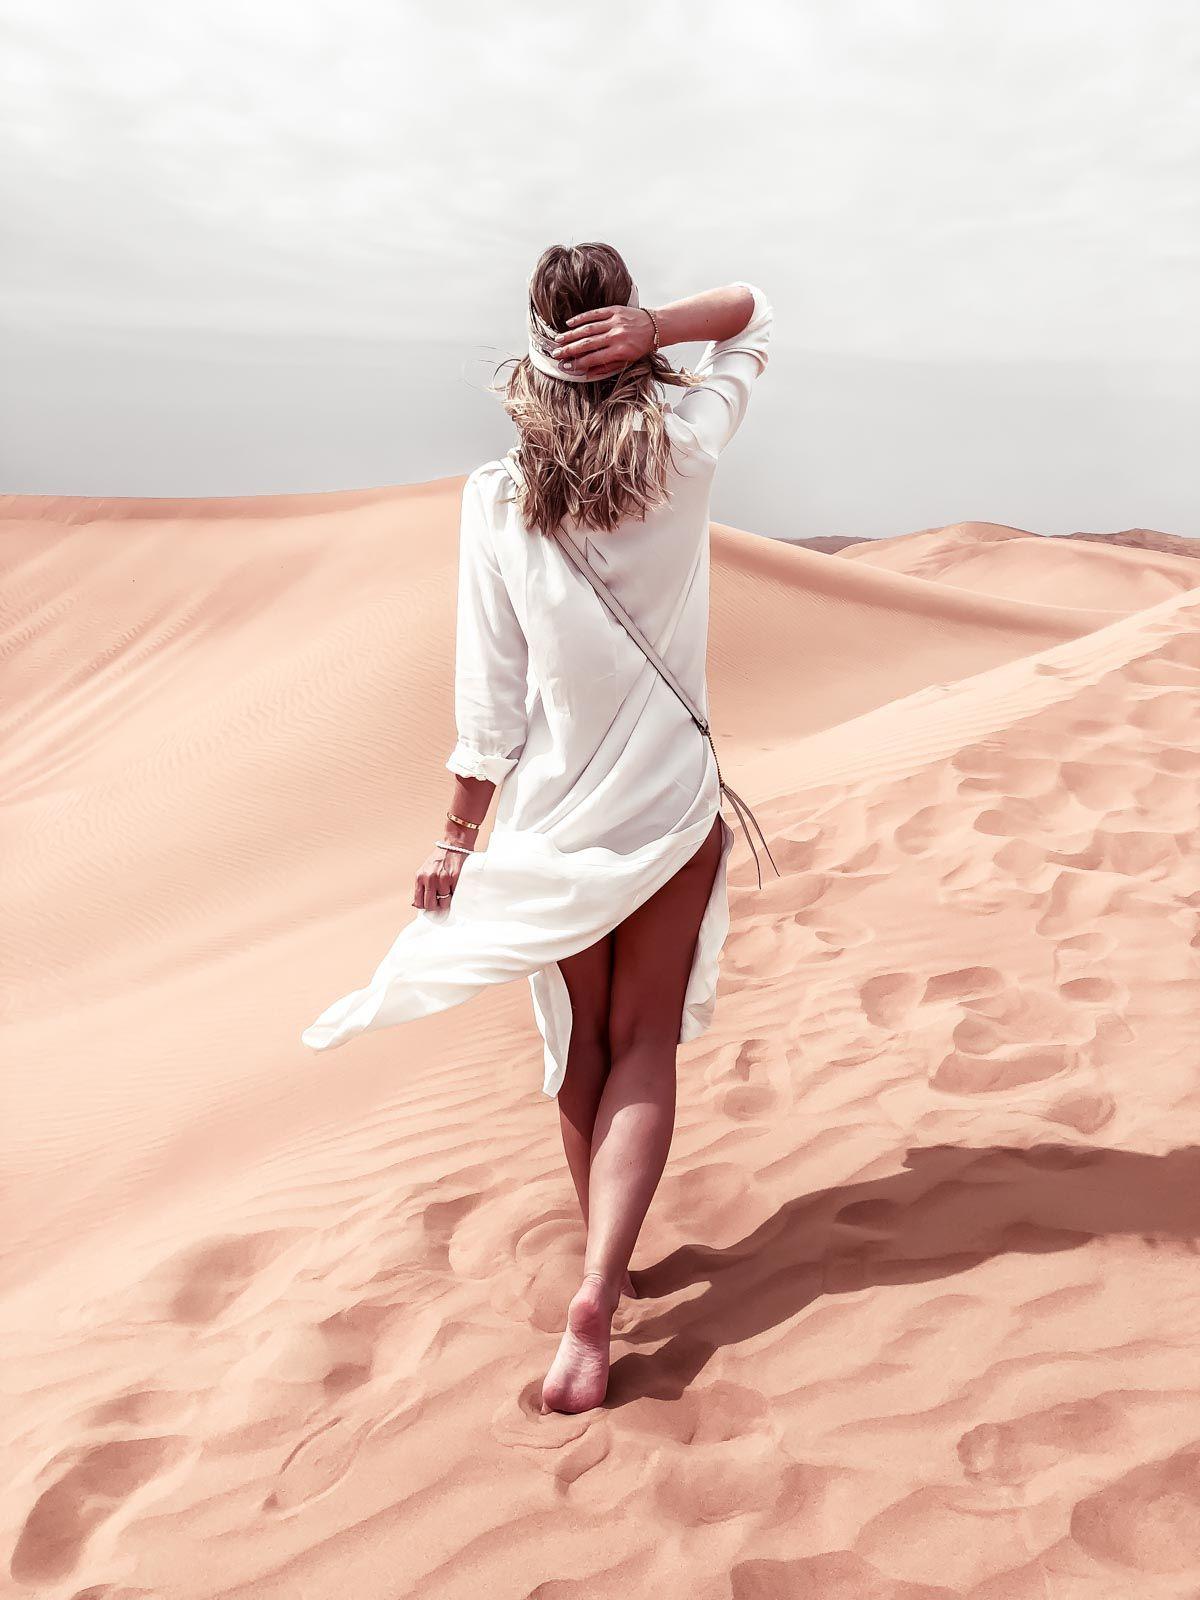 dubai desert safari - my philocaly | dubai urlaub, dubai